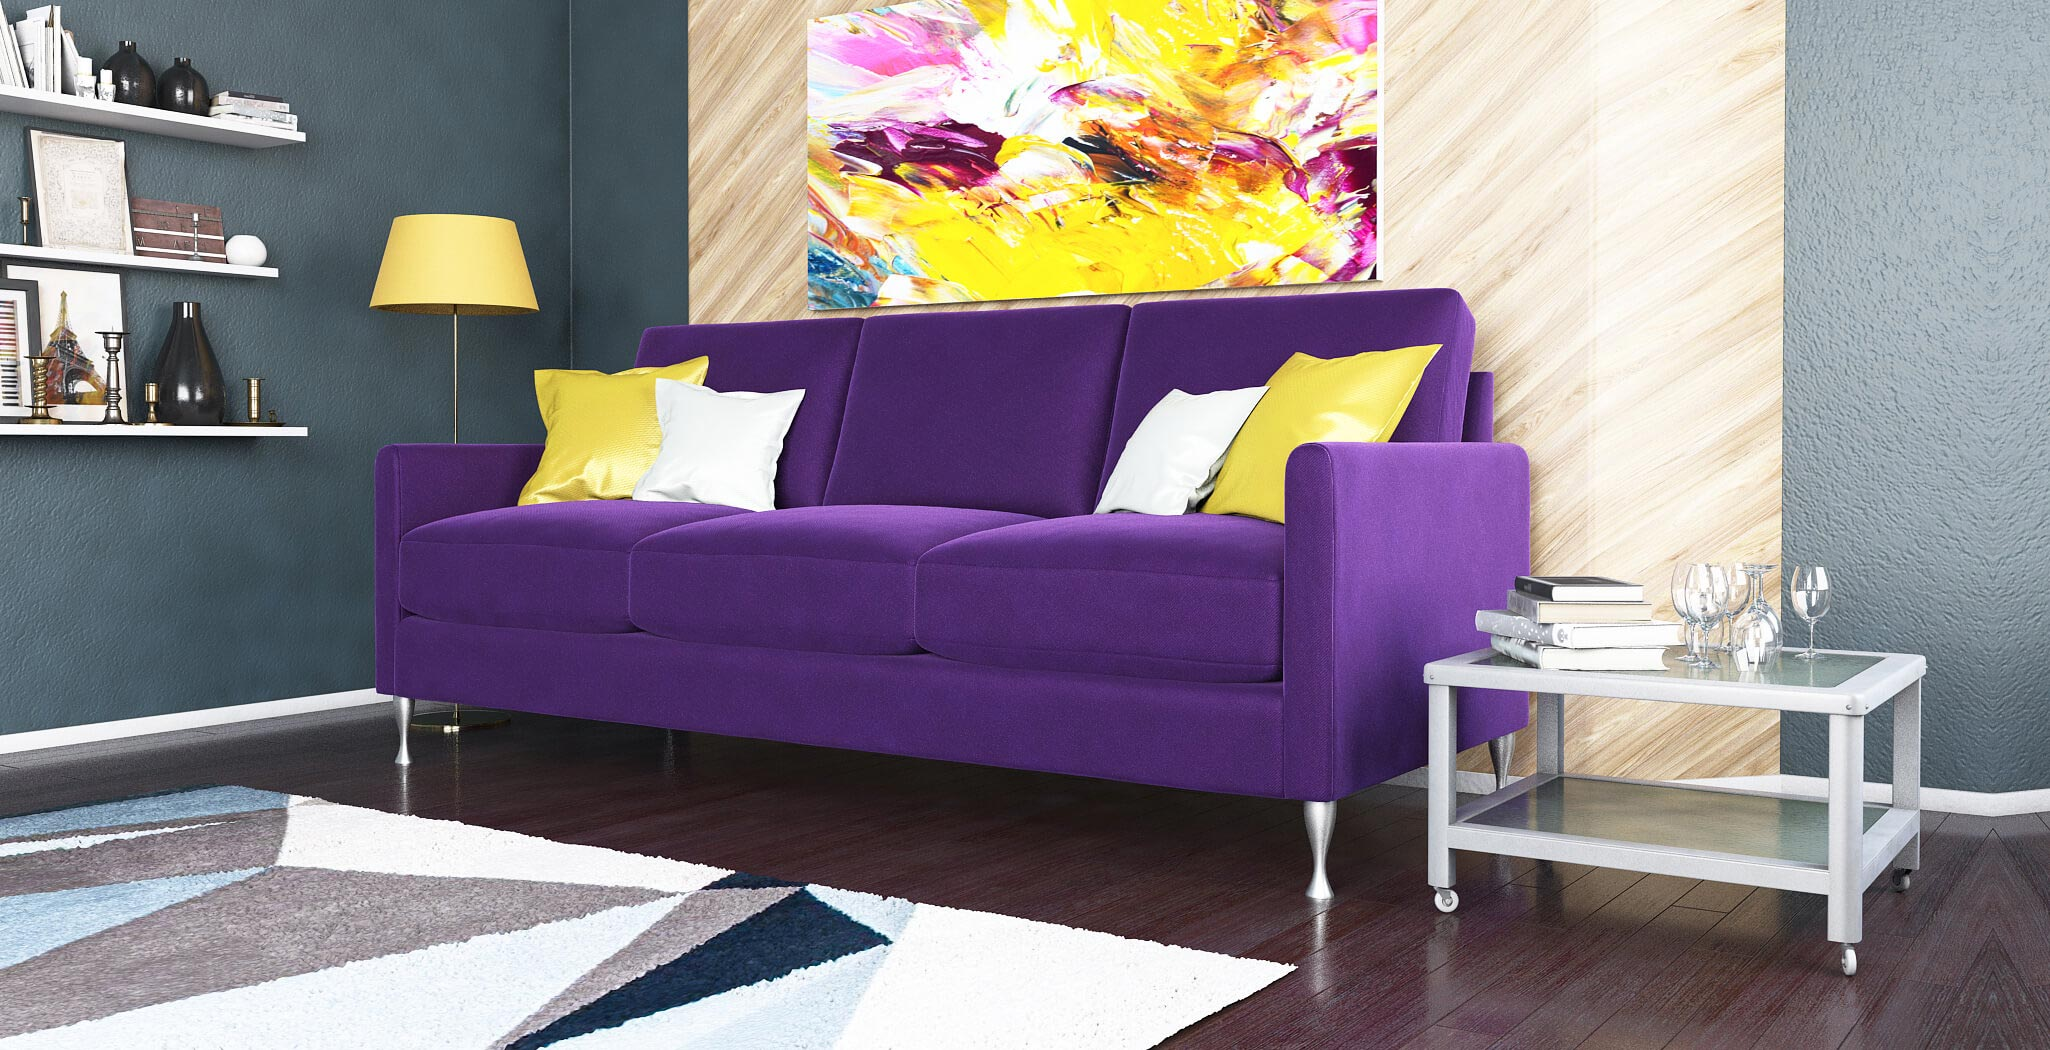 eureka sofa furniture gallery 4